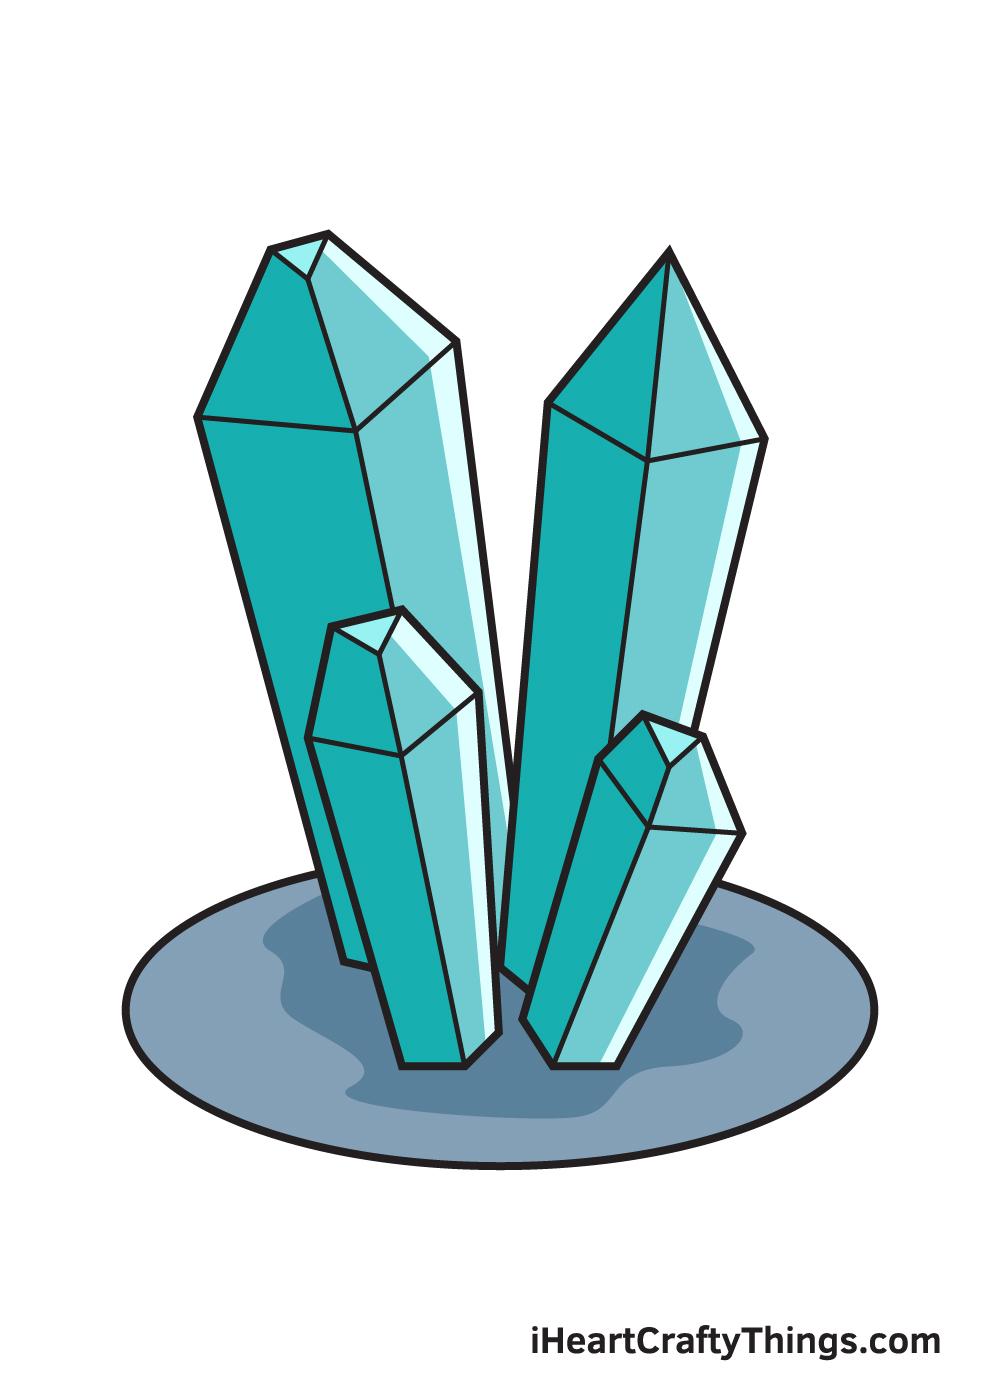 crystals drawing 9 steps